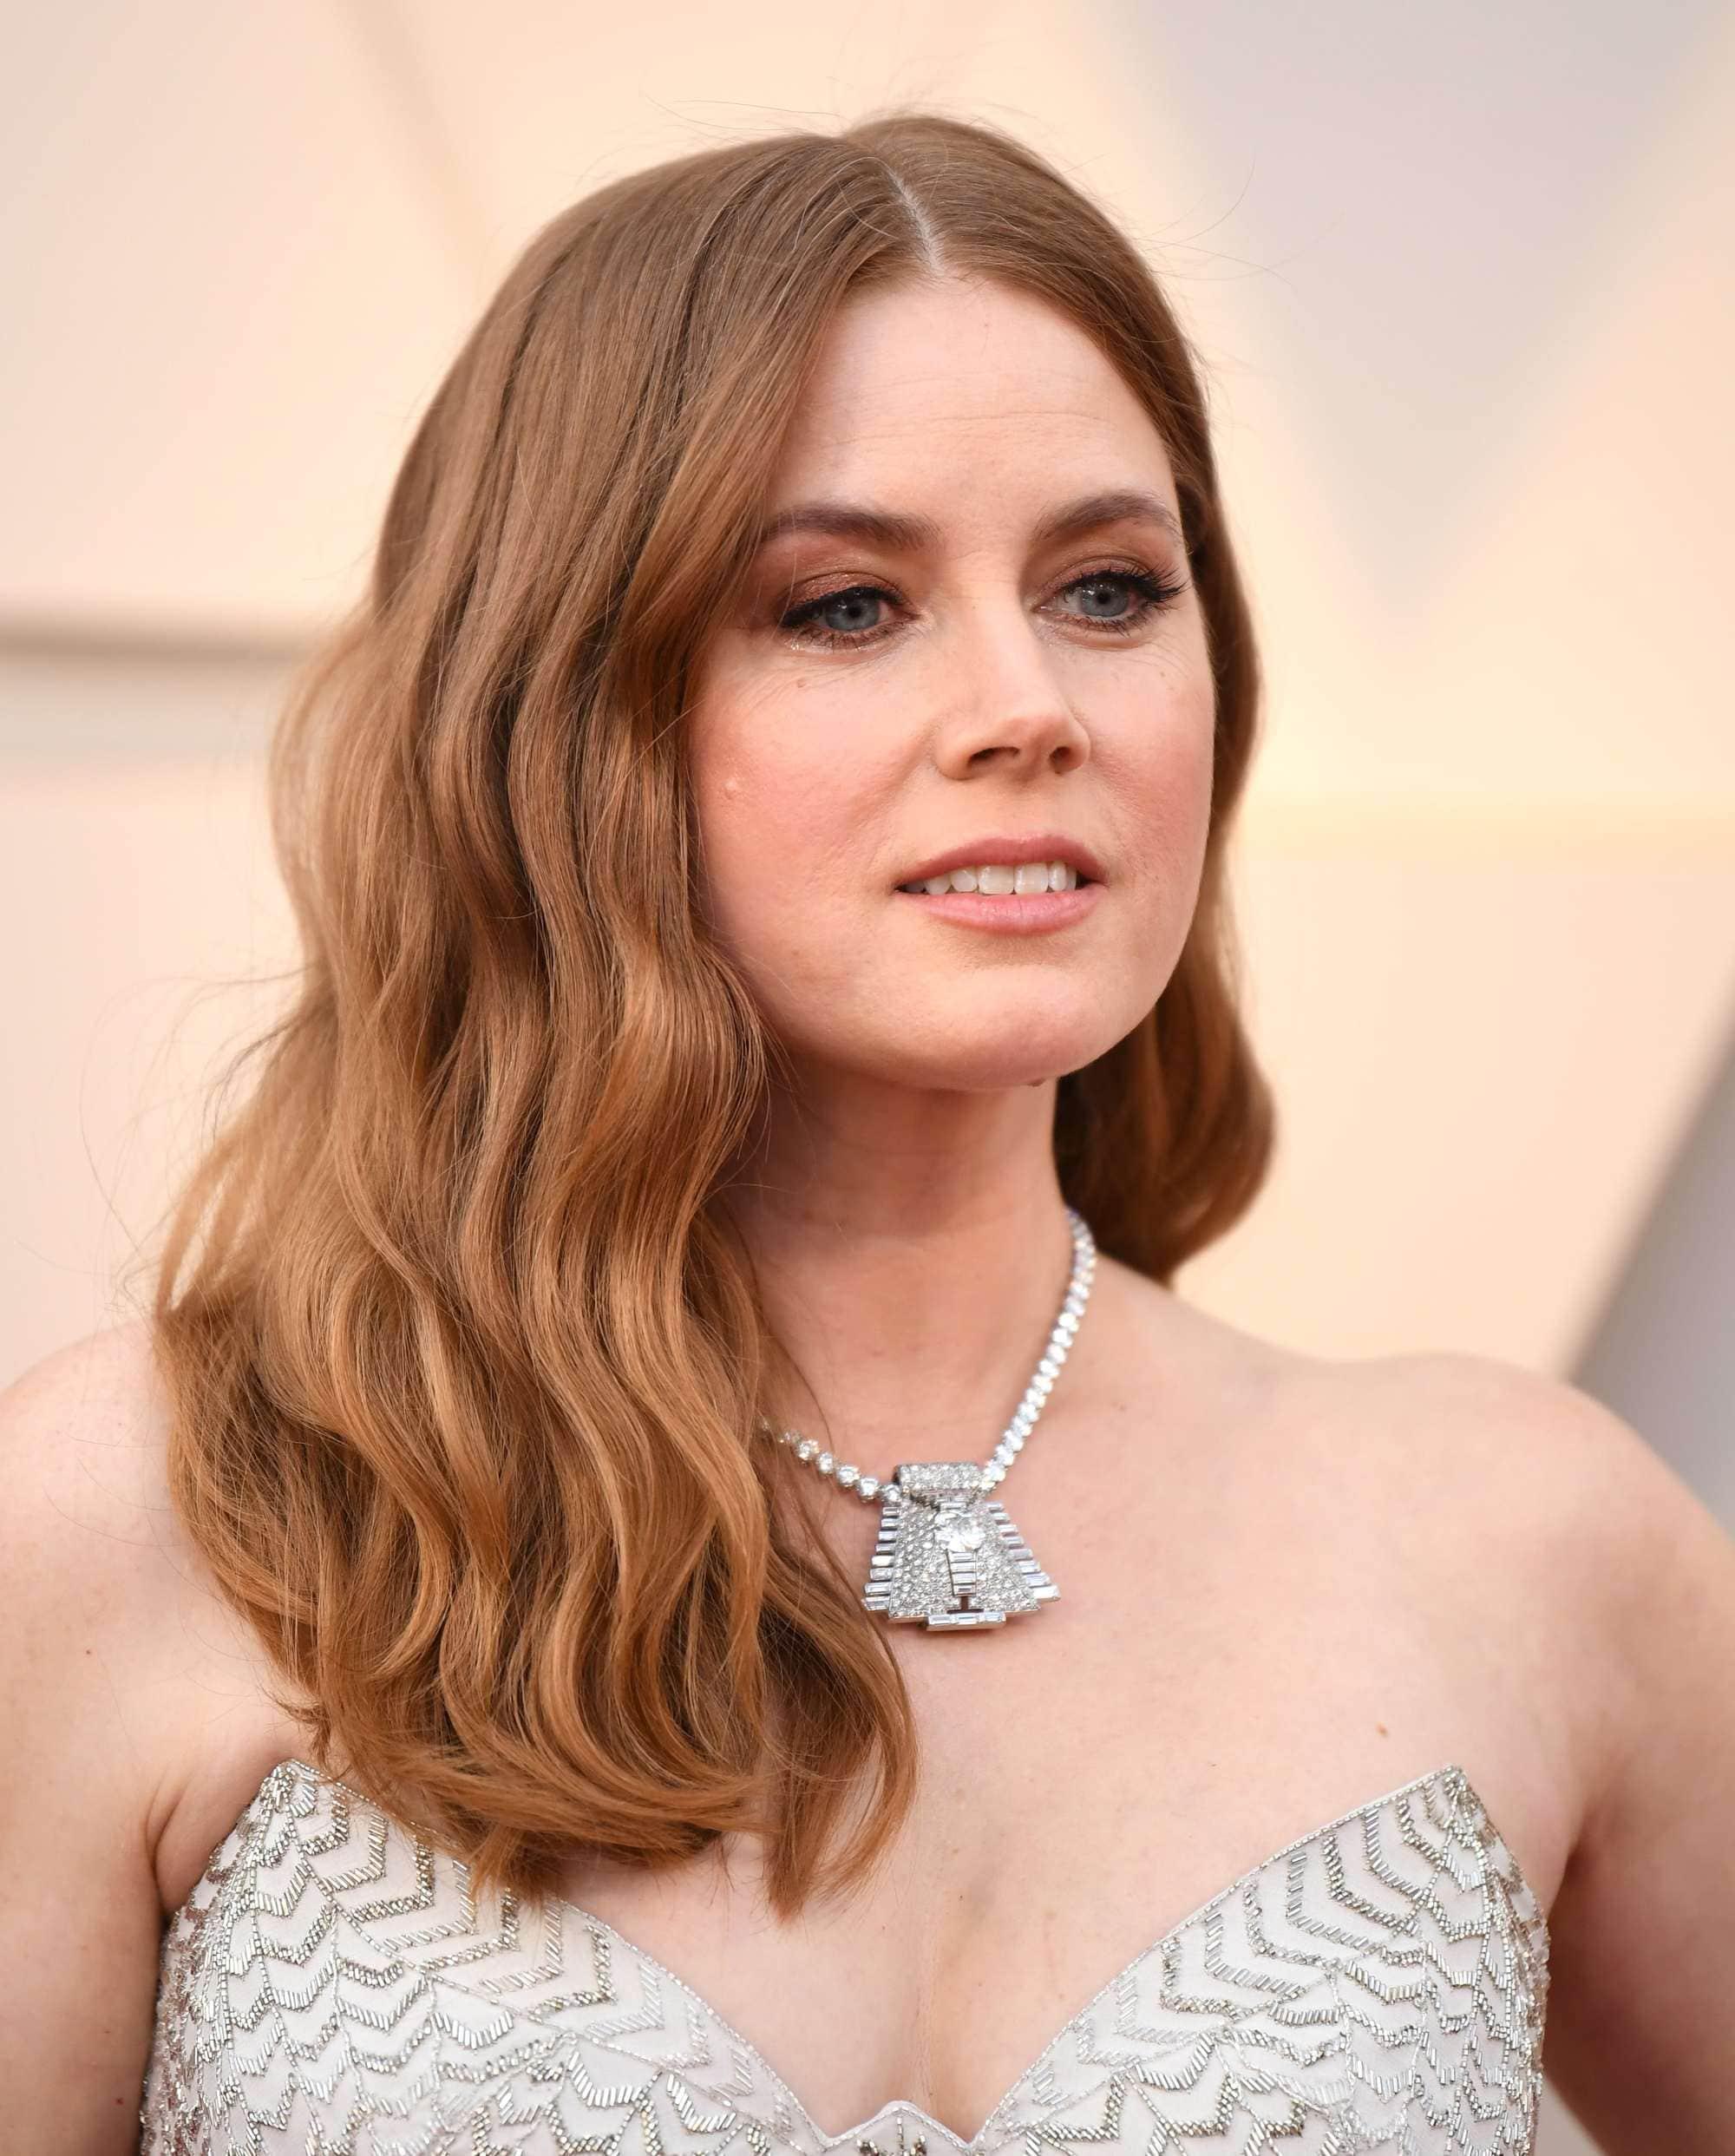 Oscars 2019 hairstyles: Amy Adams at the 2019 Oscars with auburn hair worn in sideswept beachy waves